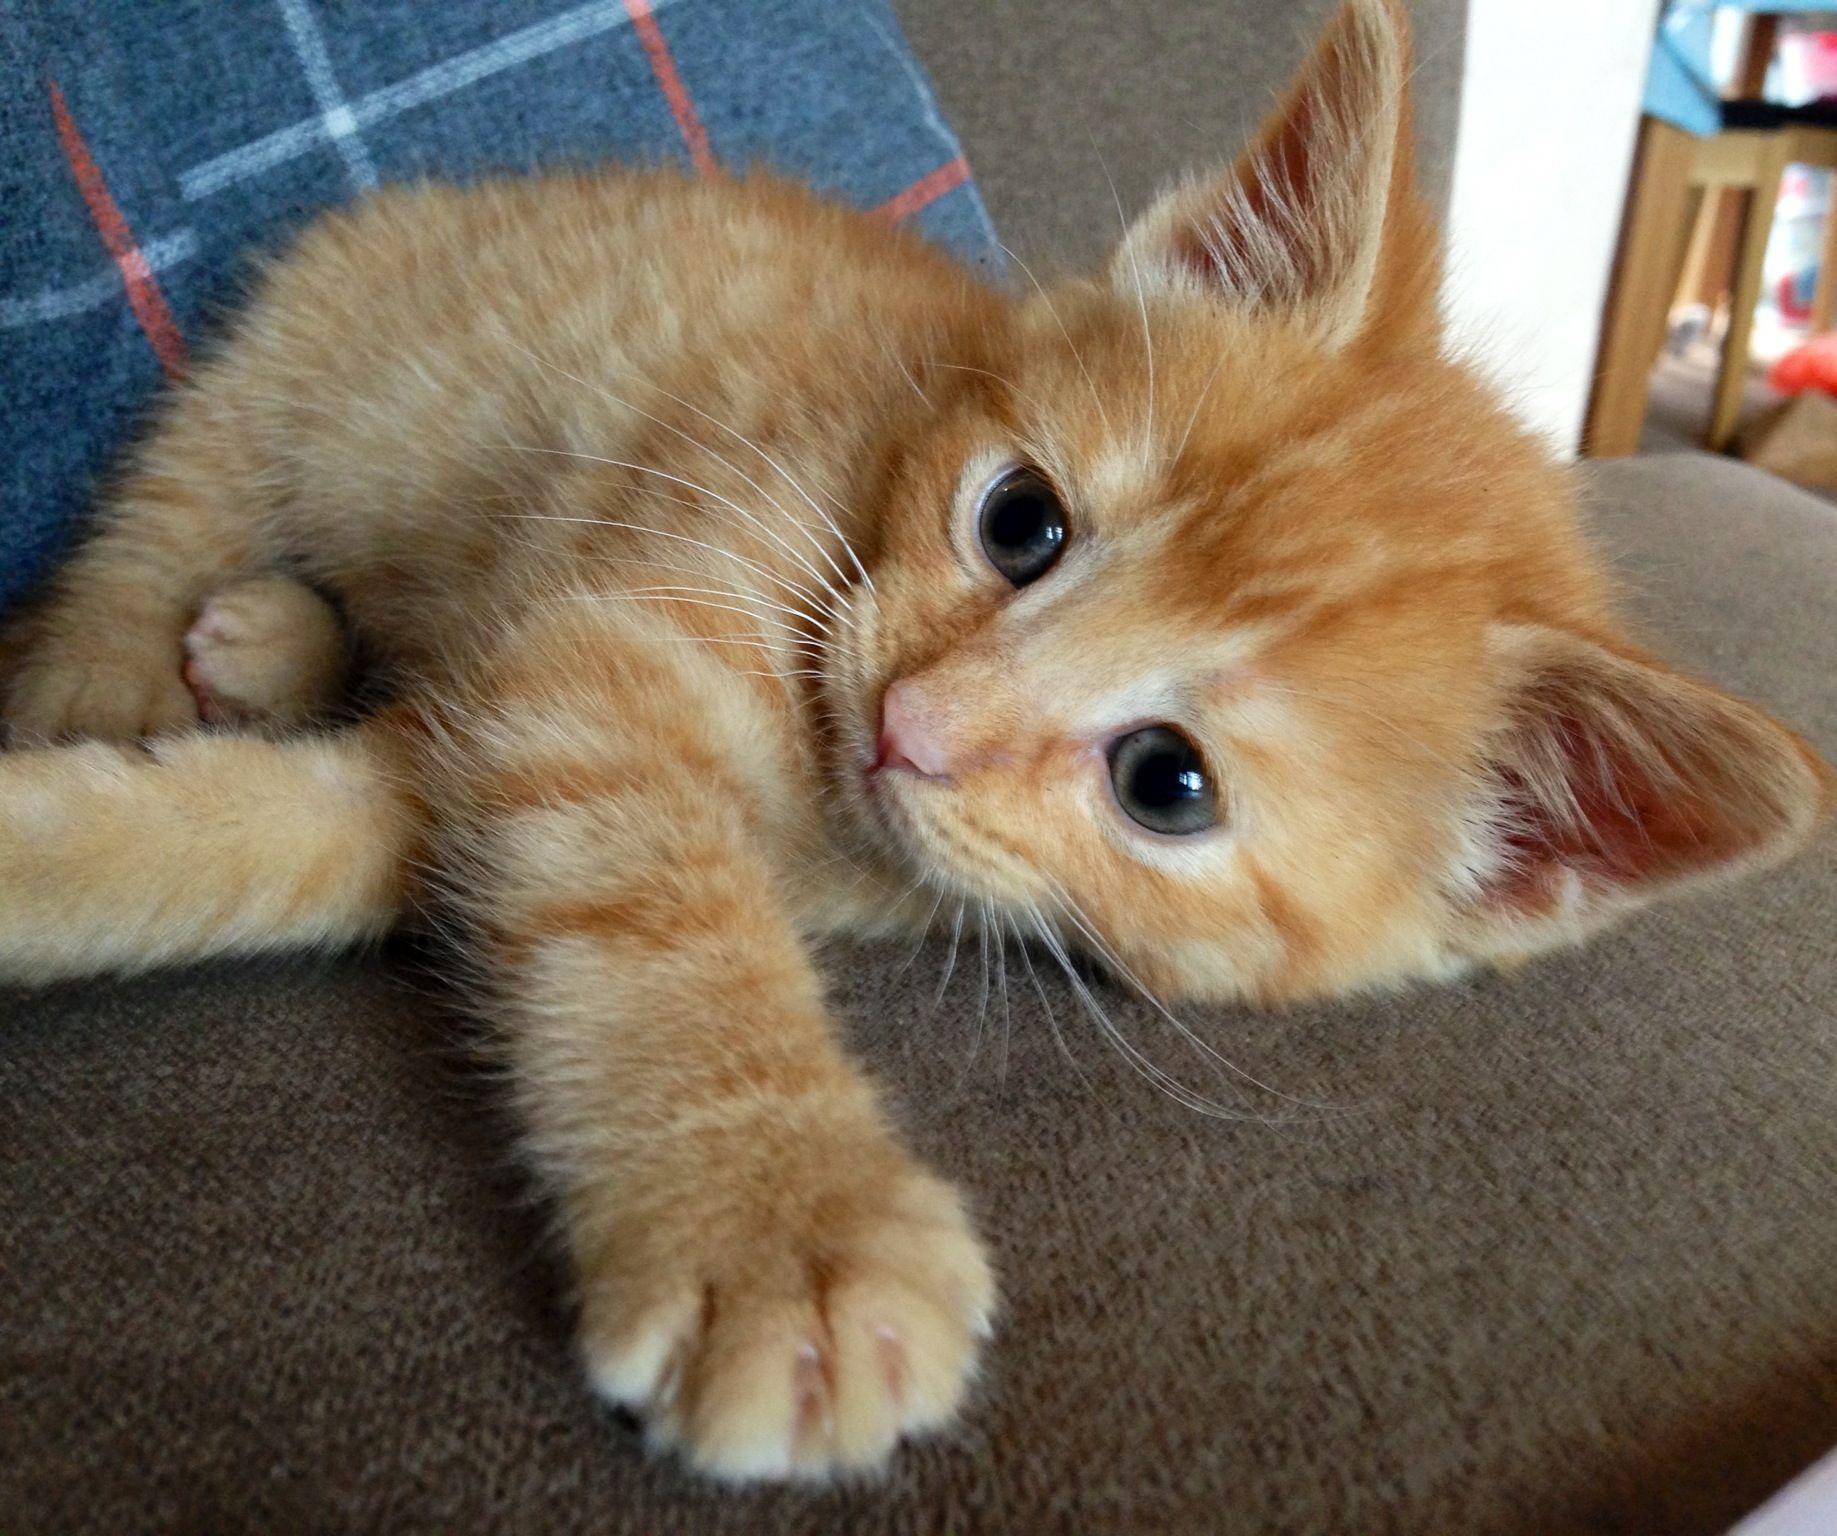 Obi Wan Katnobi Ginger Kitten Cute Kittens Cutest Cute Cats Baby Cats